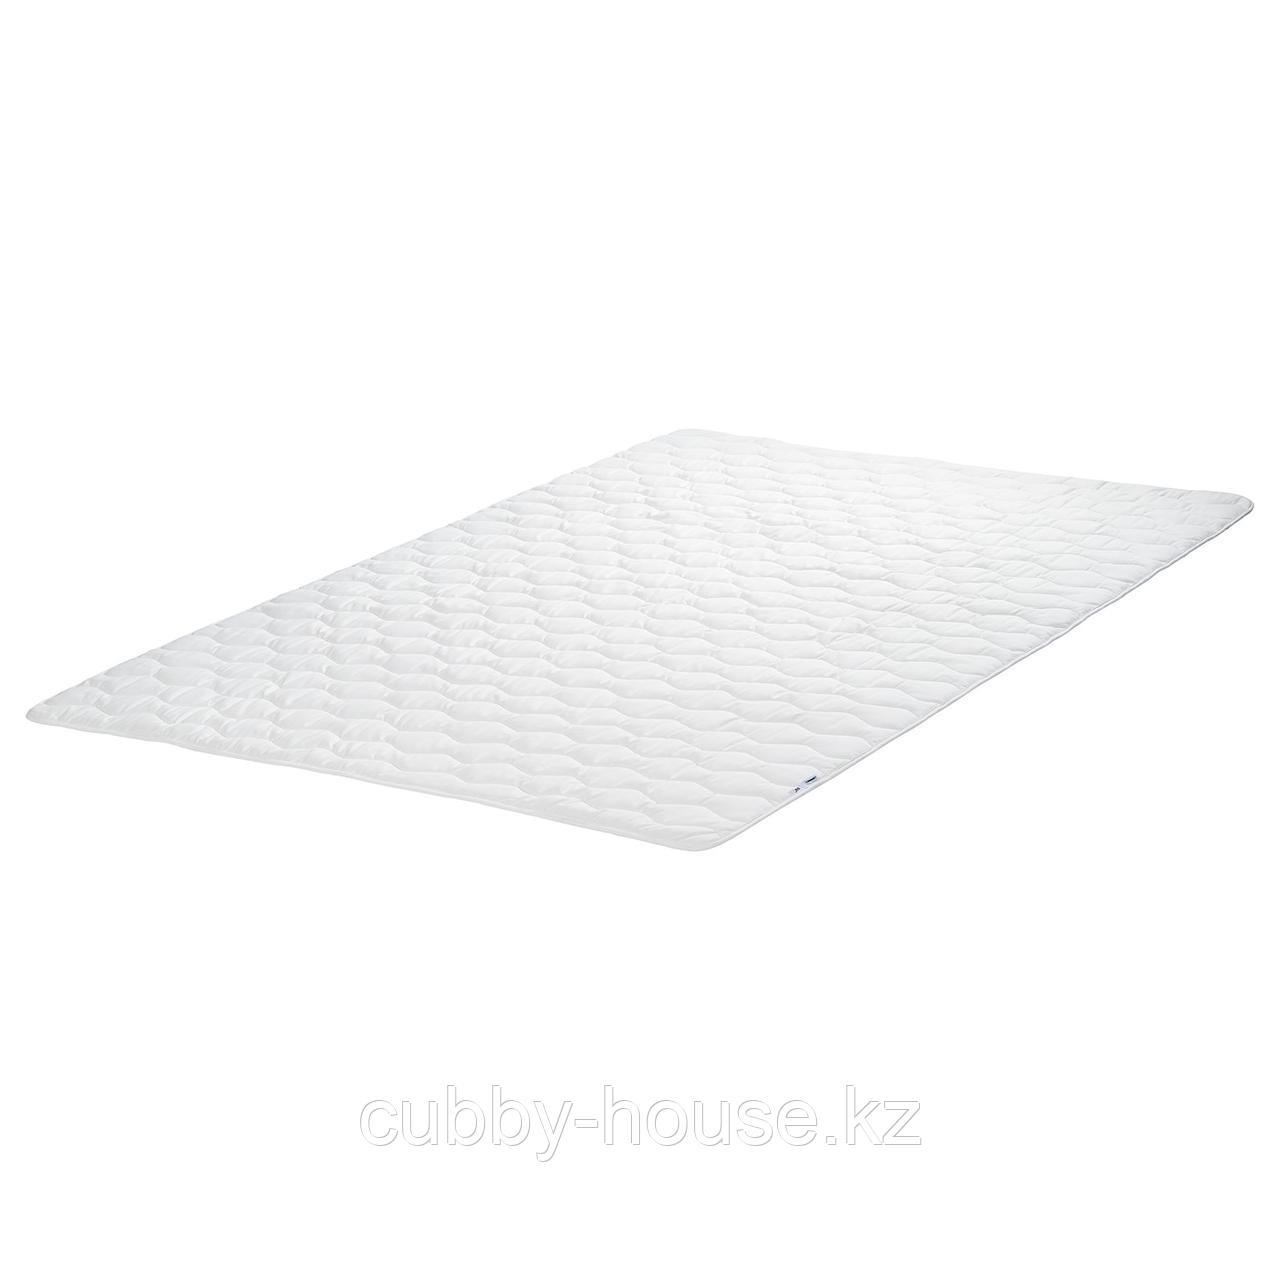 ЛИСМАРКА Тонкий матрас, белый, 180x200 см